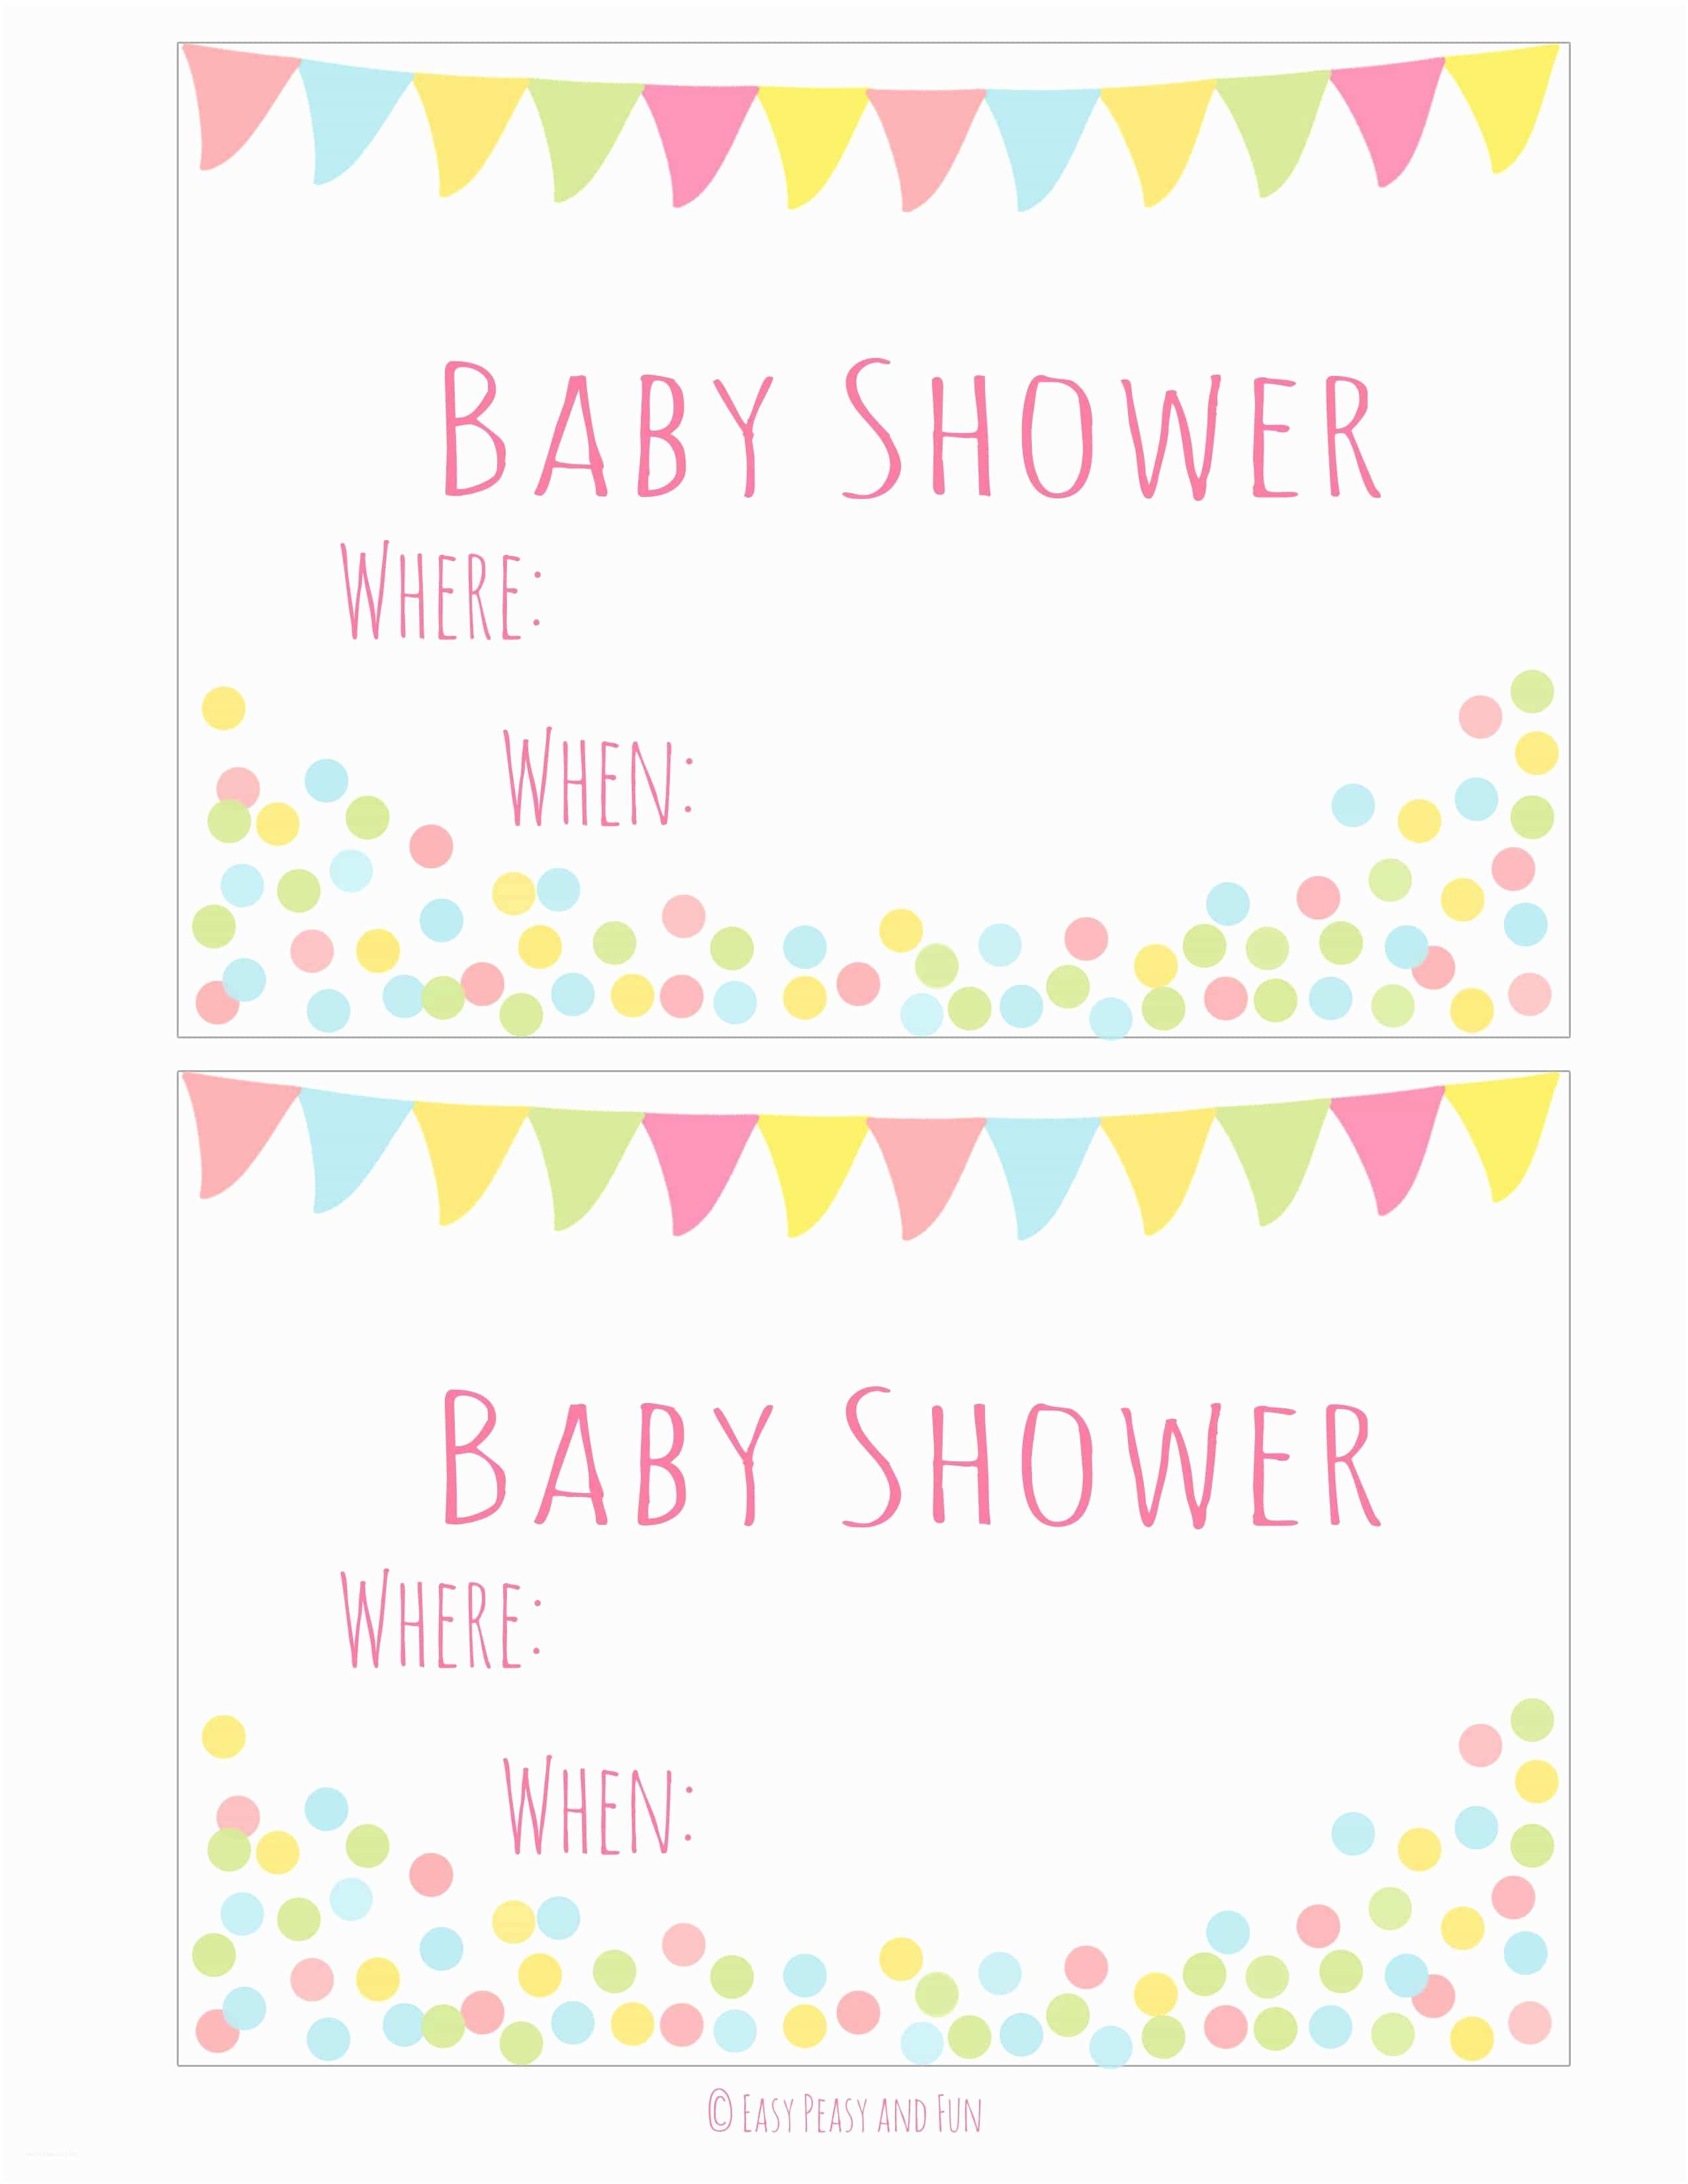 Free Baby Shower Invitation Free Printable Baby Shower Invitation Easy Peasy and Fun